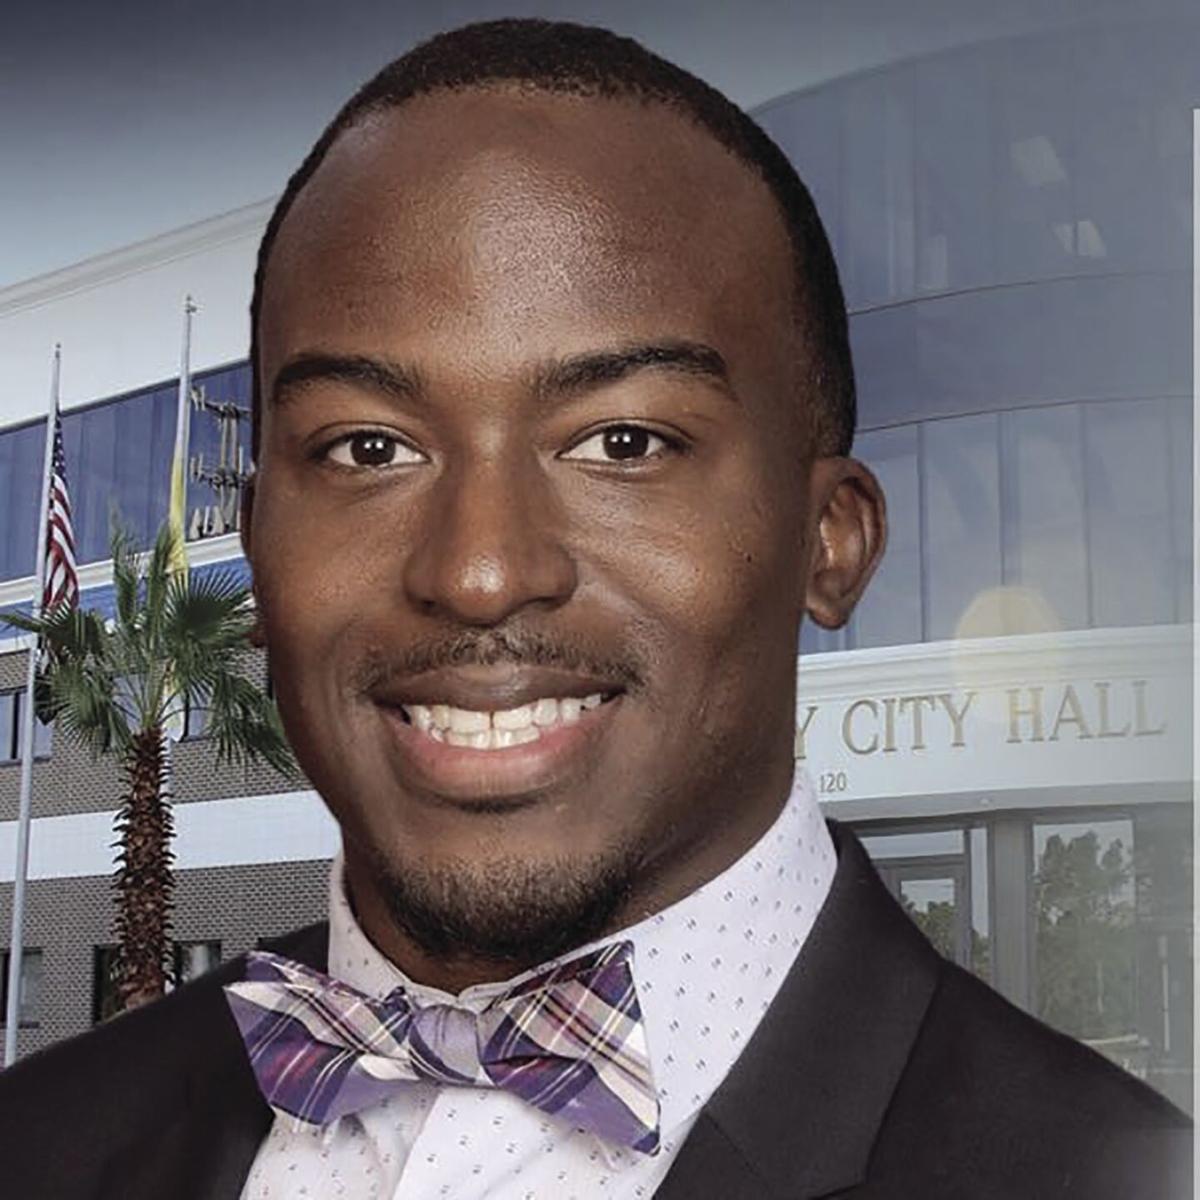 Palm Bay City Councilman Kenny Johnson